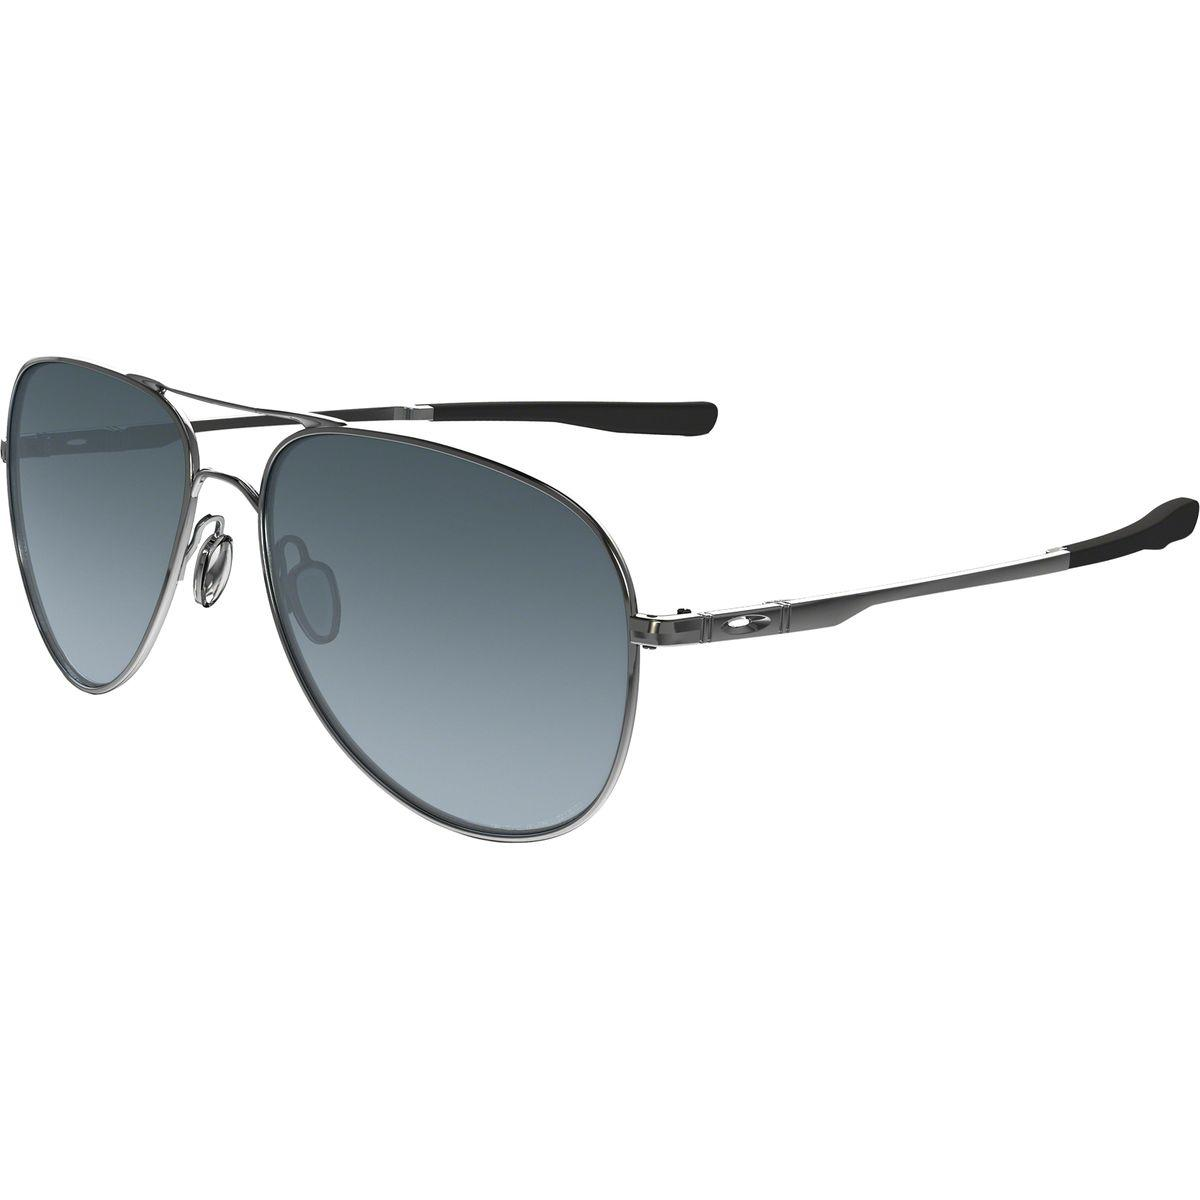 852212bc18b Lyst - Oakley Elmont Sunglasses - Polarized in Gray for Men - Save ...